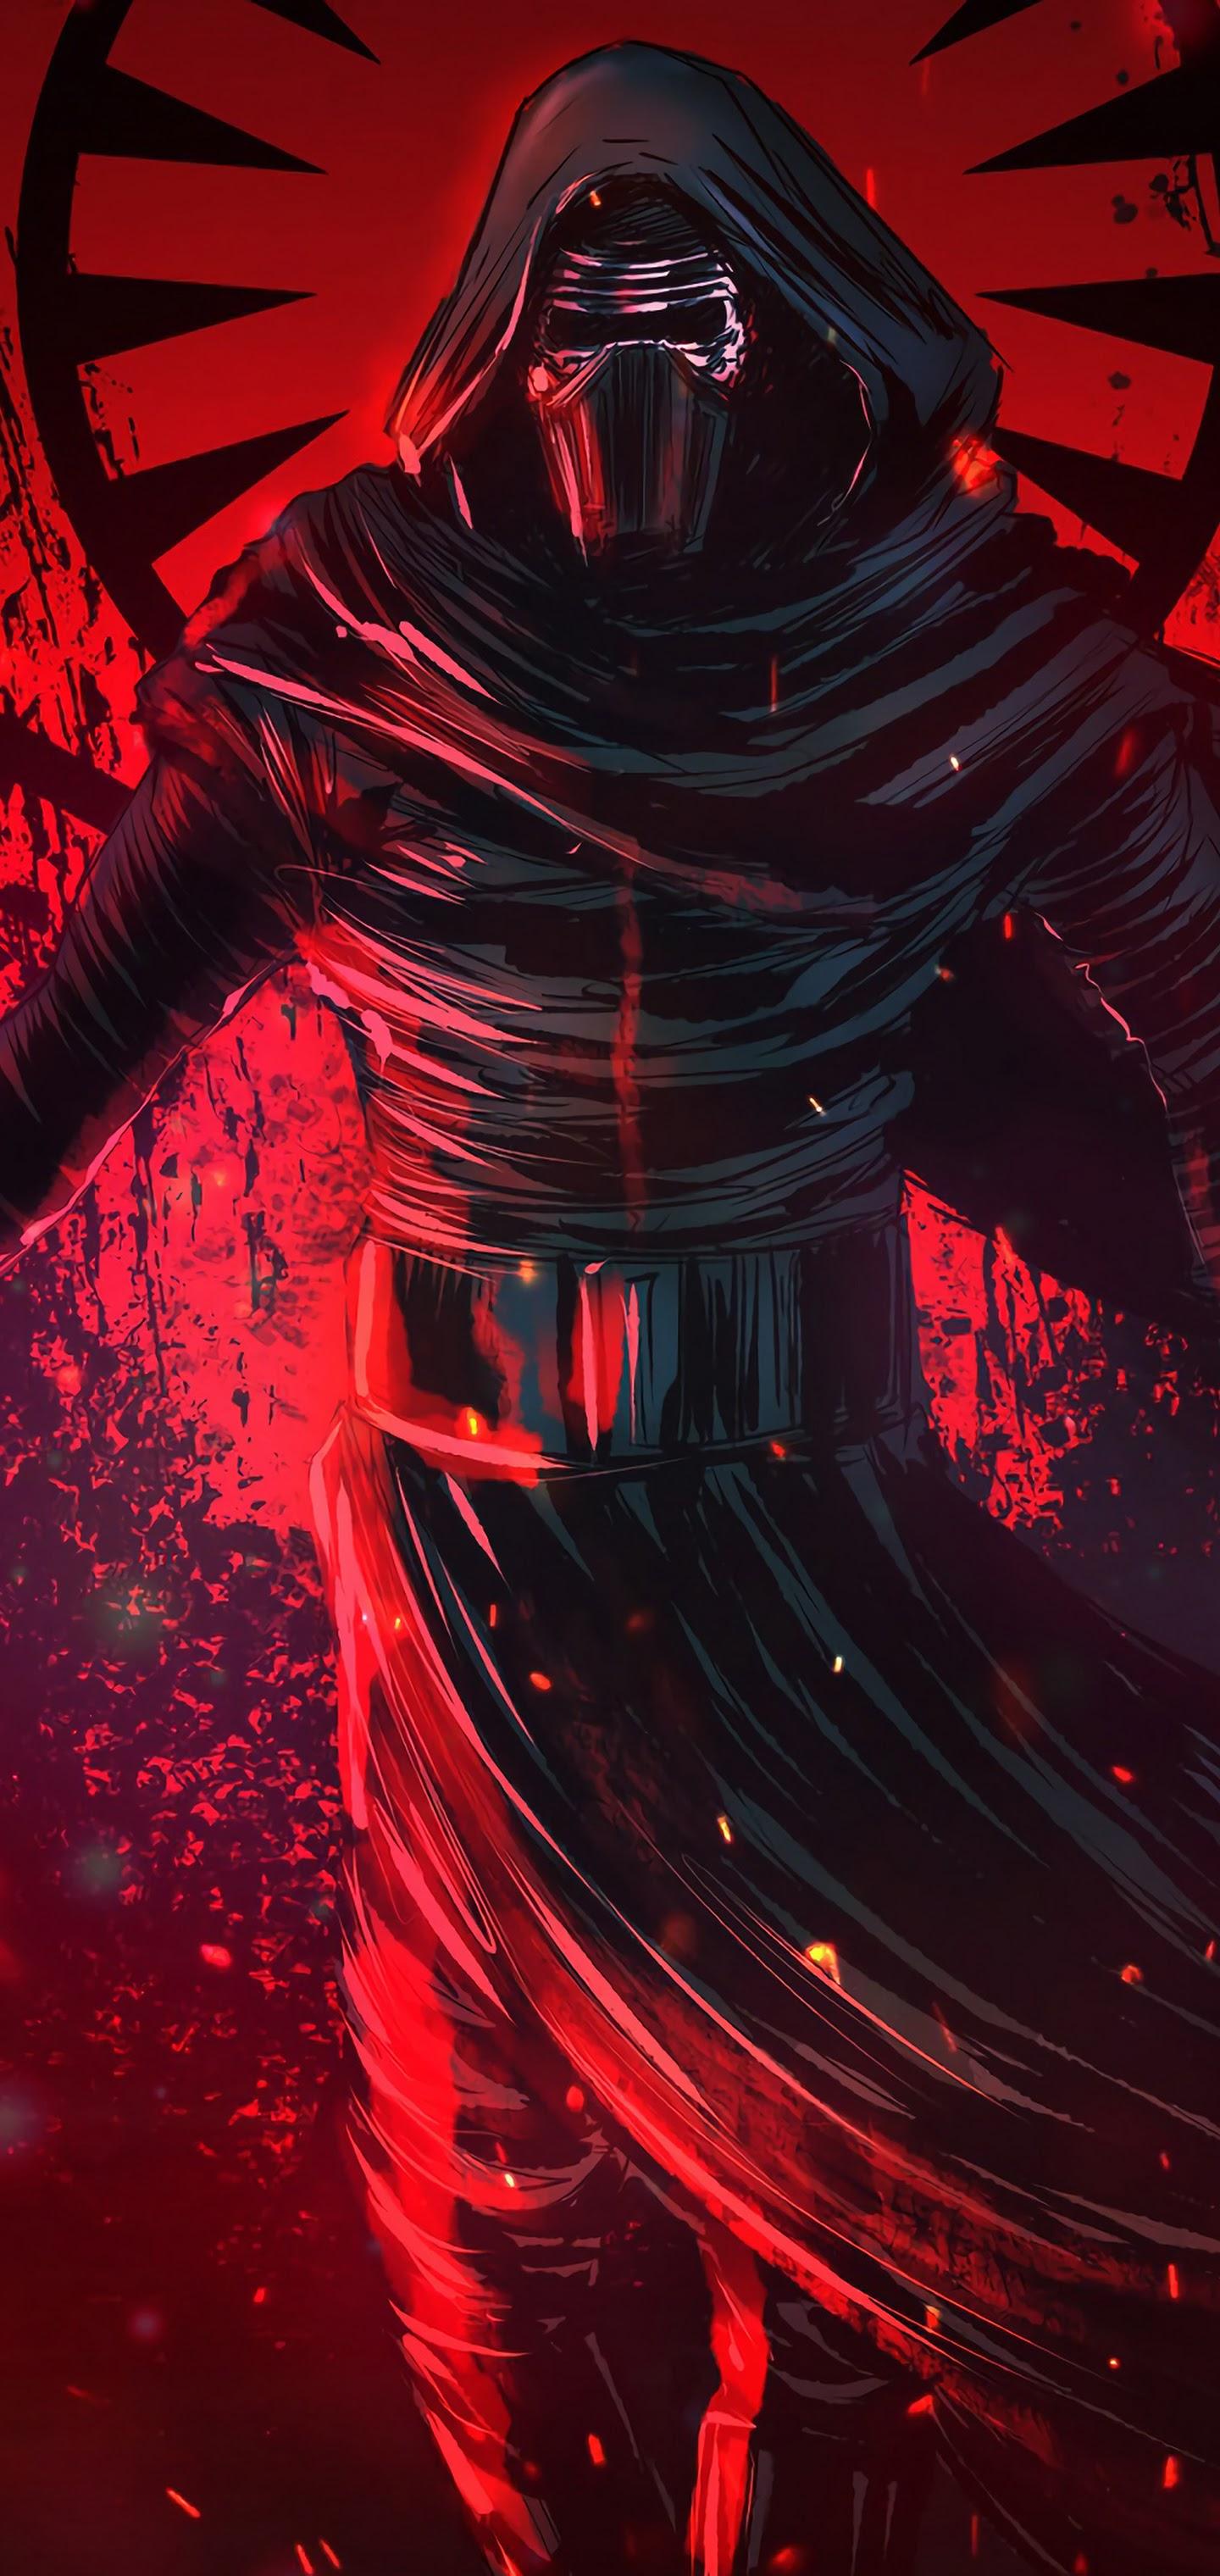 Kylo Ren Lightsaber Star Wars 4K 3840x2160 Wallpaper 16